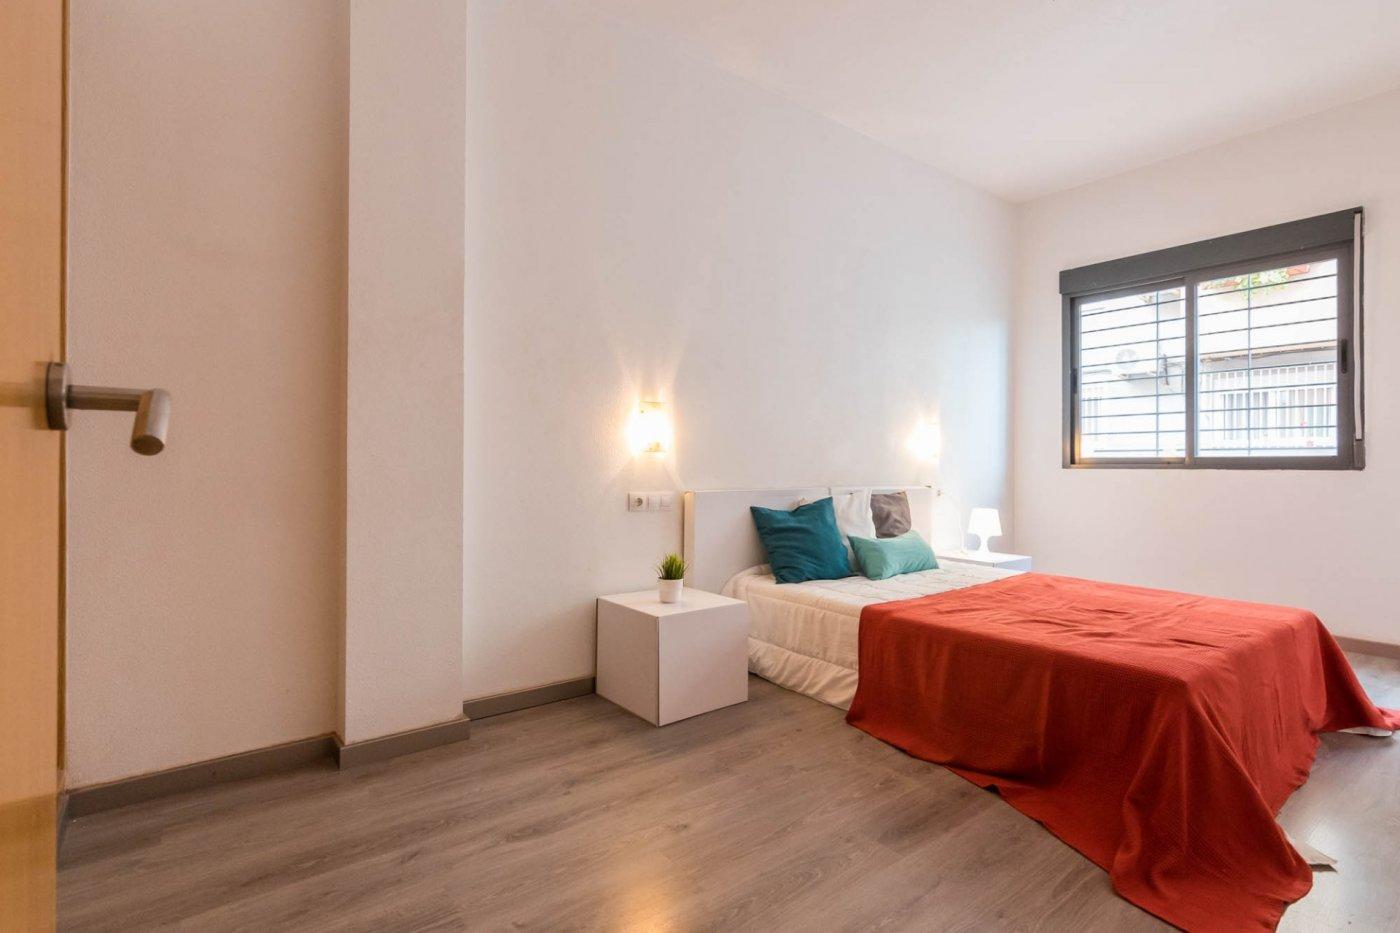 Apartamento · Murcia · Barrio Del Progreso 79.900€€